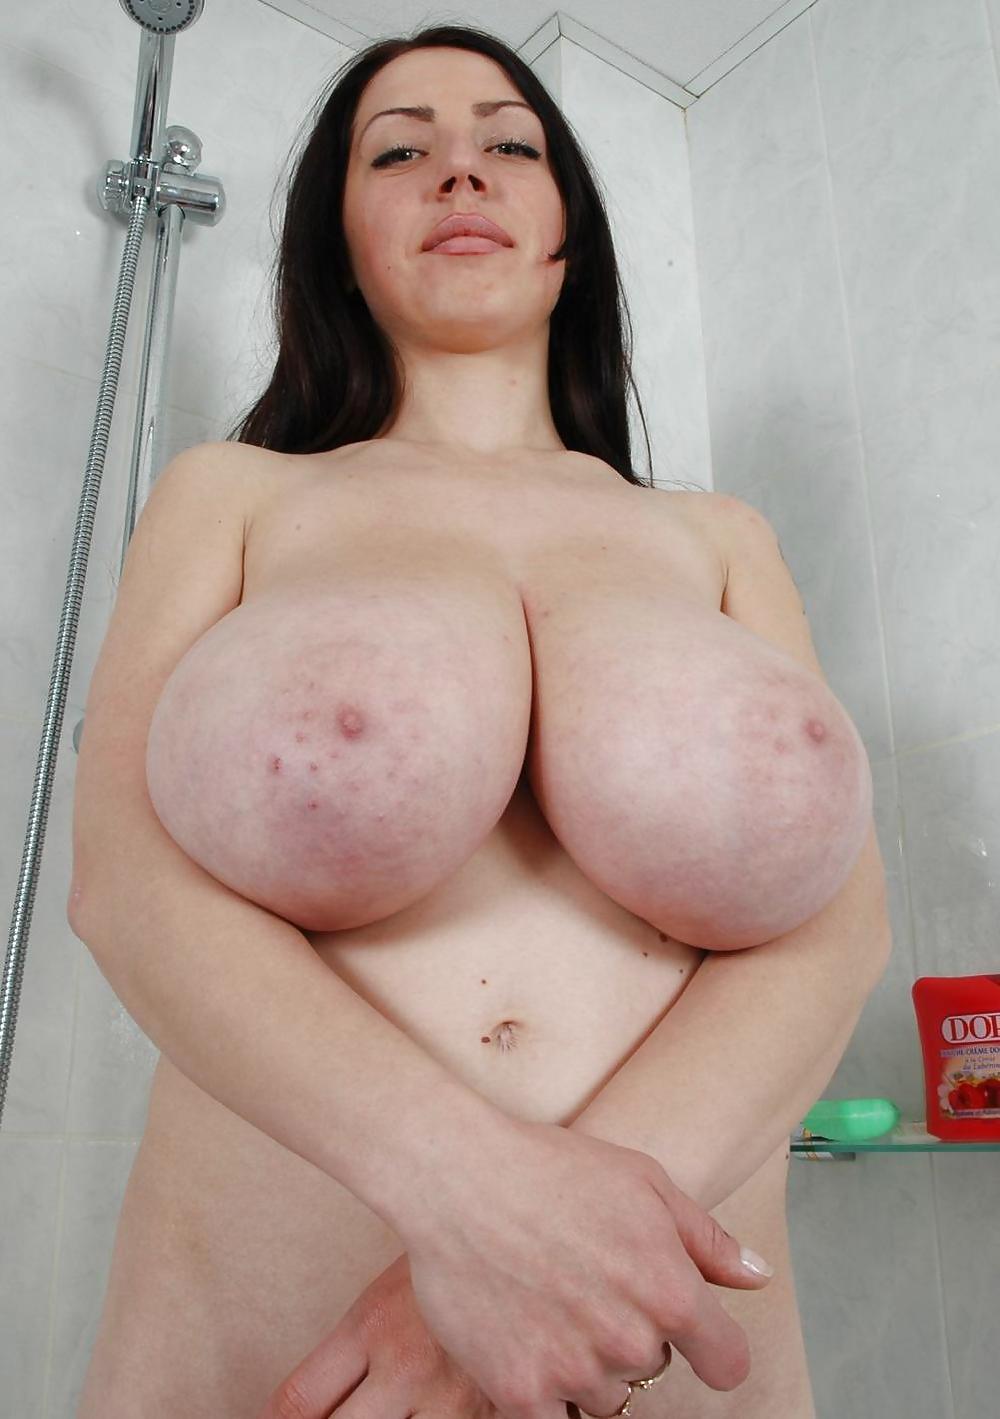 Paula patton pechos en topless